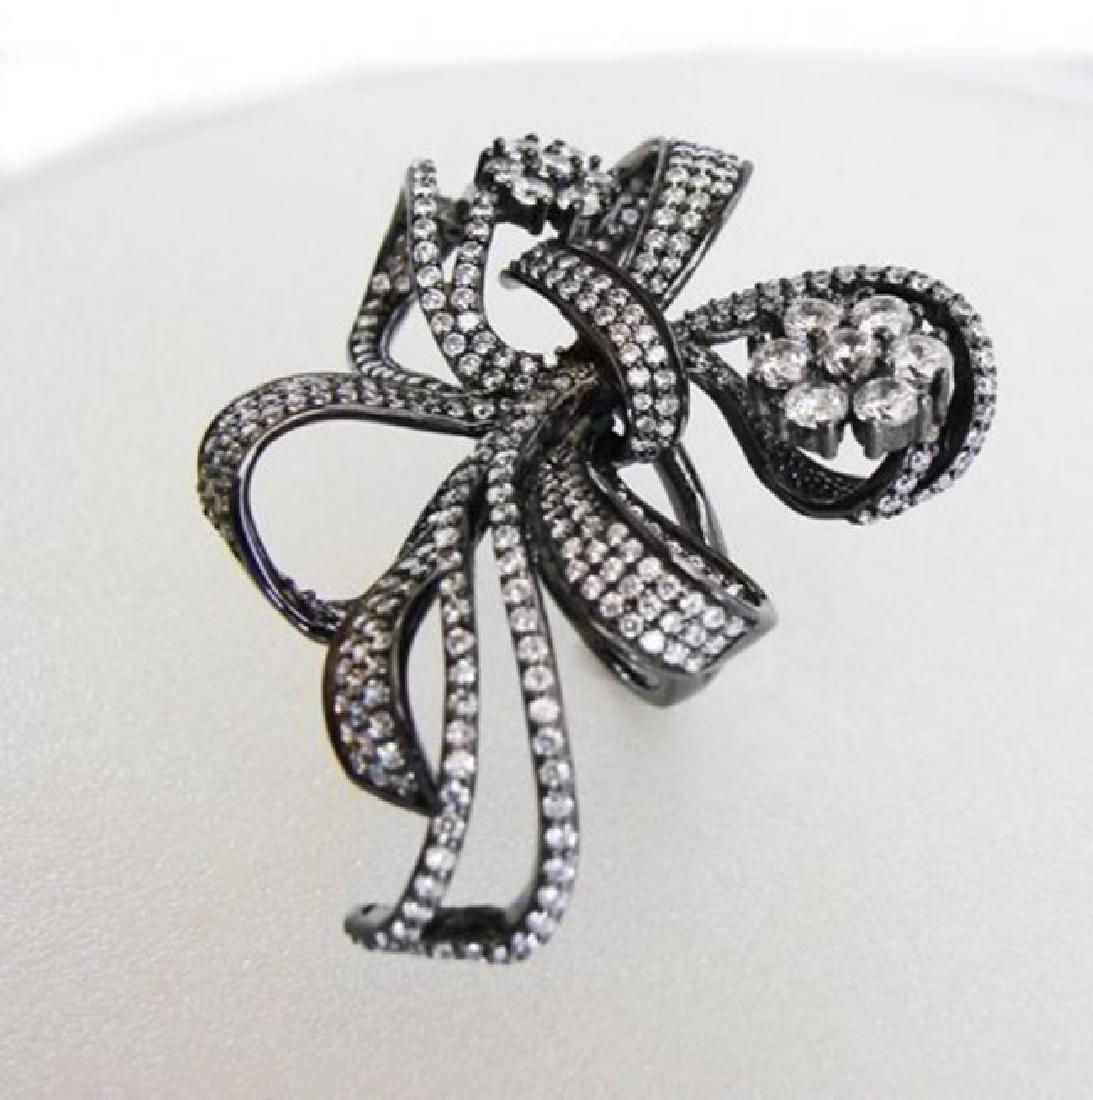 Creation Diamond Ring 7.15 CT 18K Antique Gold Overlay - 2